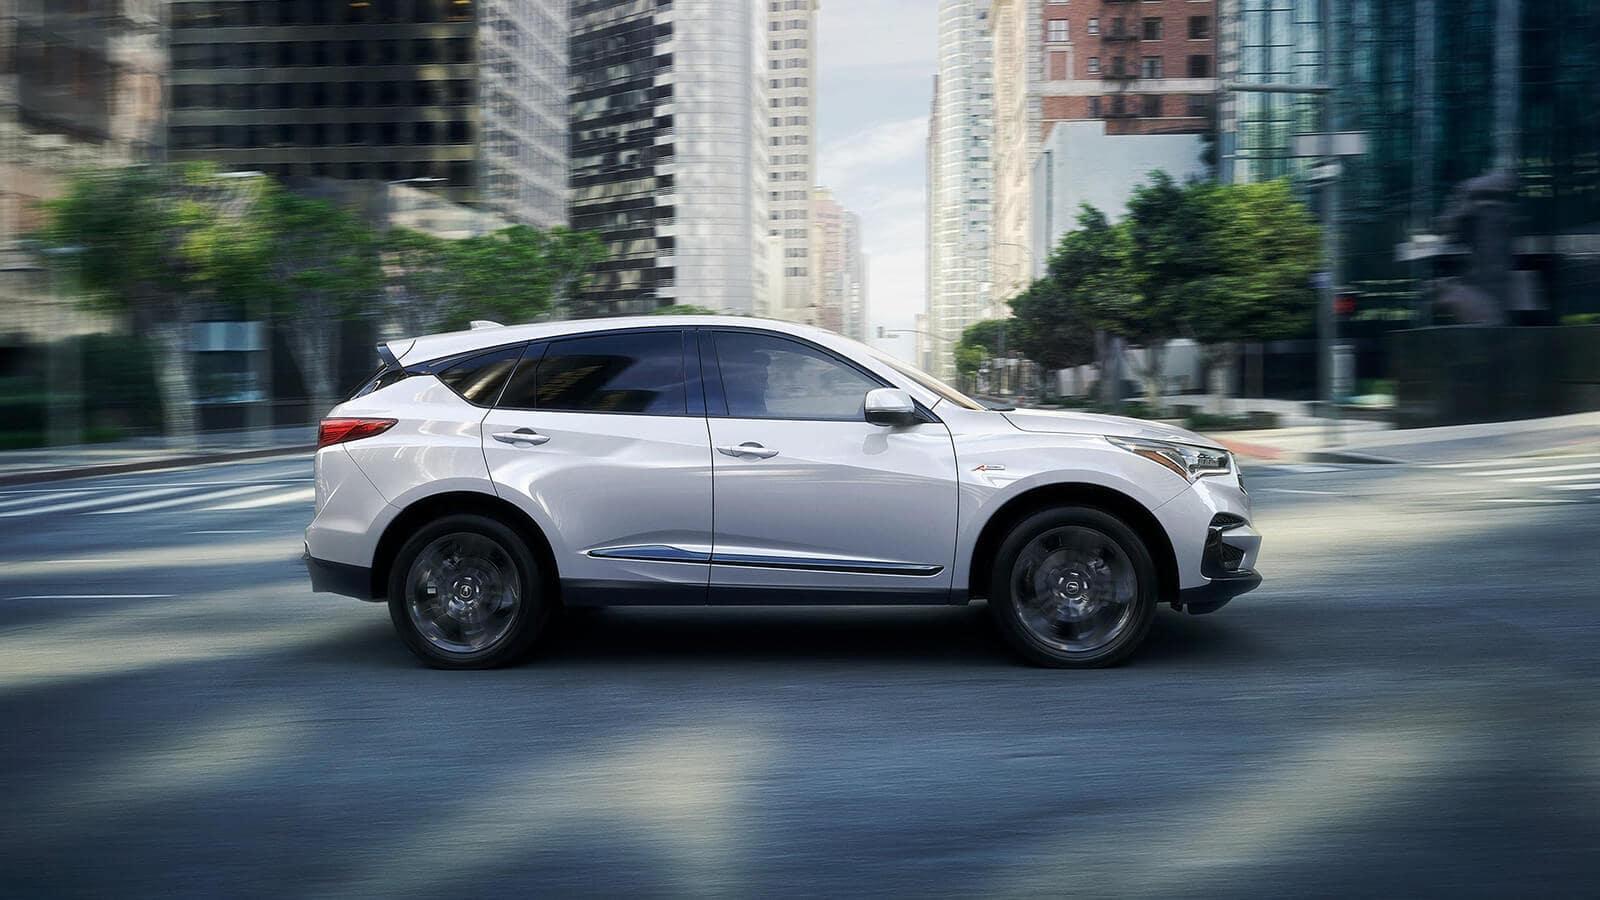 2020 Acura RDX Exterior Side Profile White